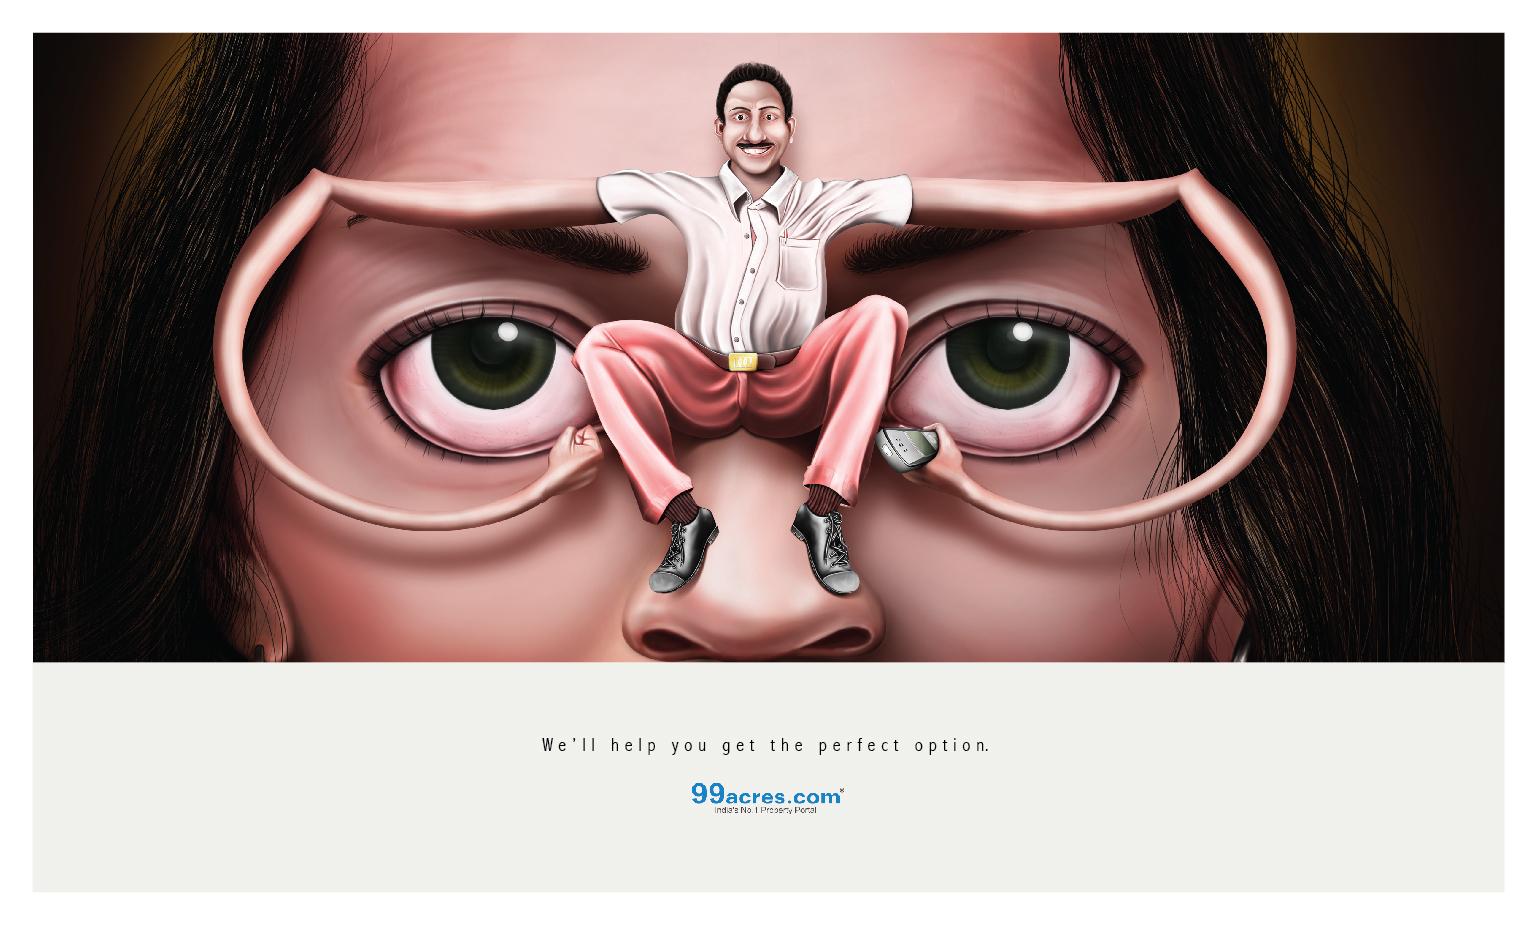 print-creatif-inspiration-olybop-nov-2016-2